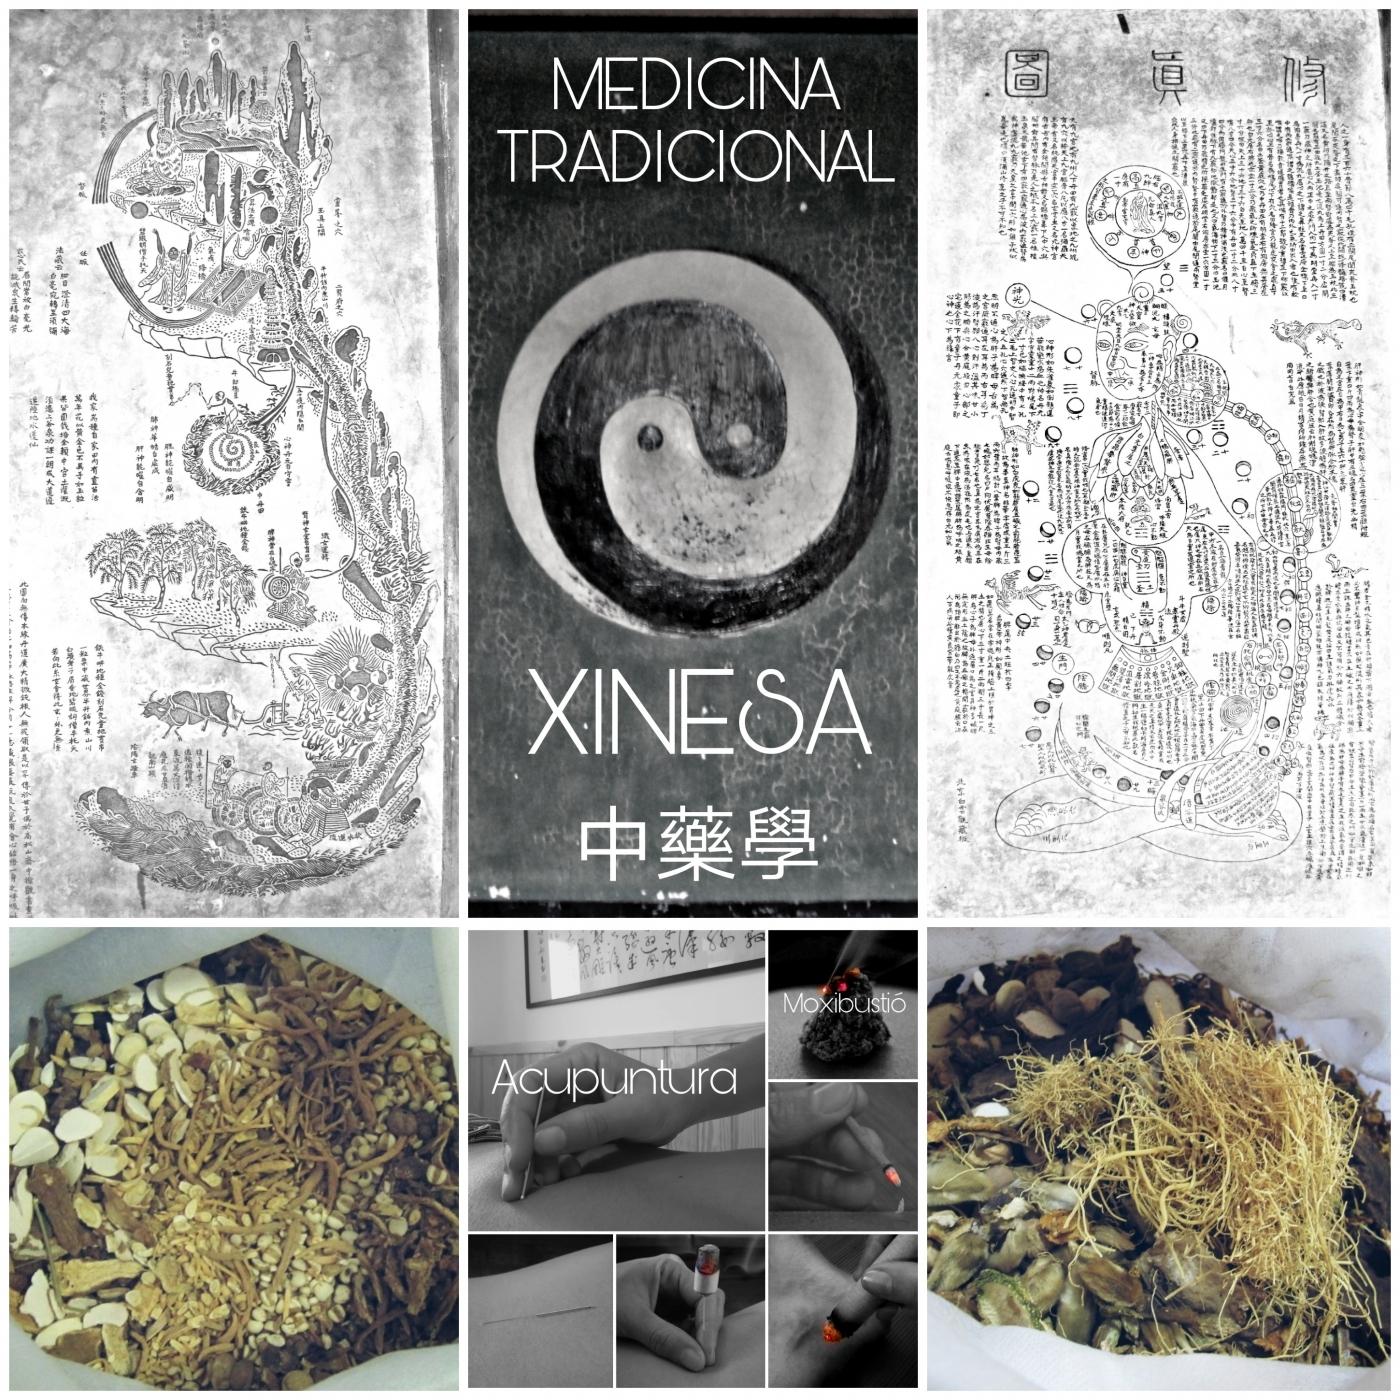 Medicina tradicional Xinesa -